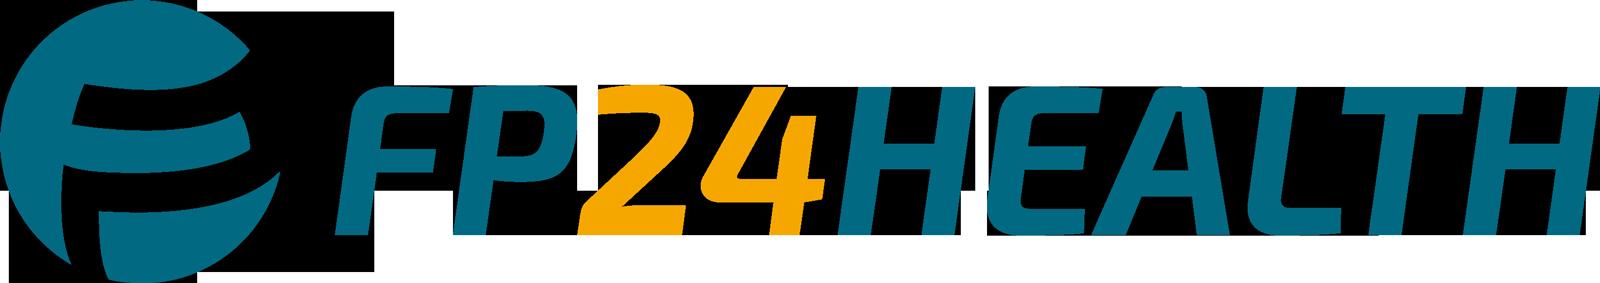 FP24 HEALTH